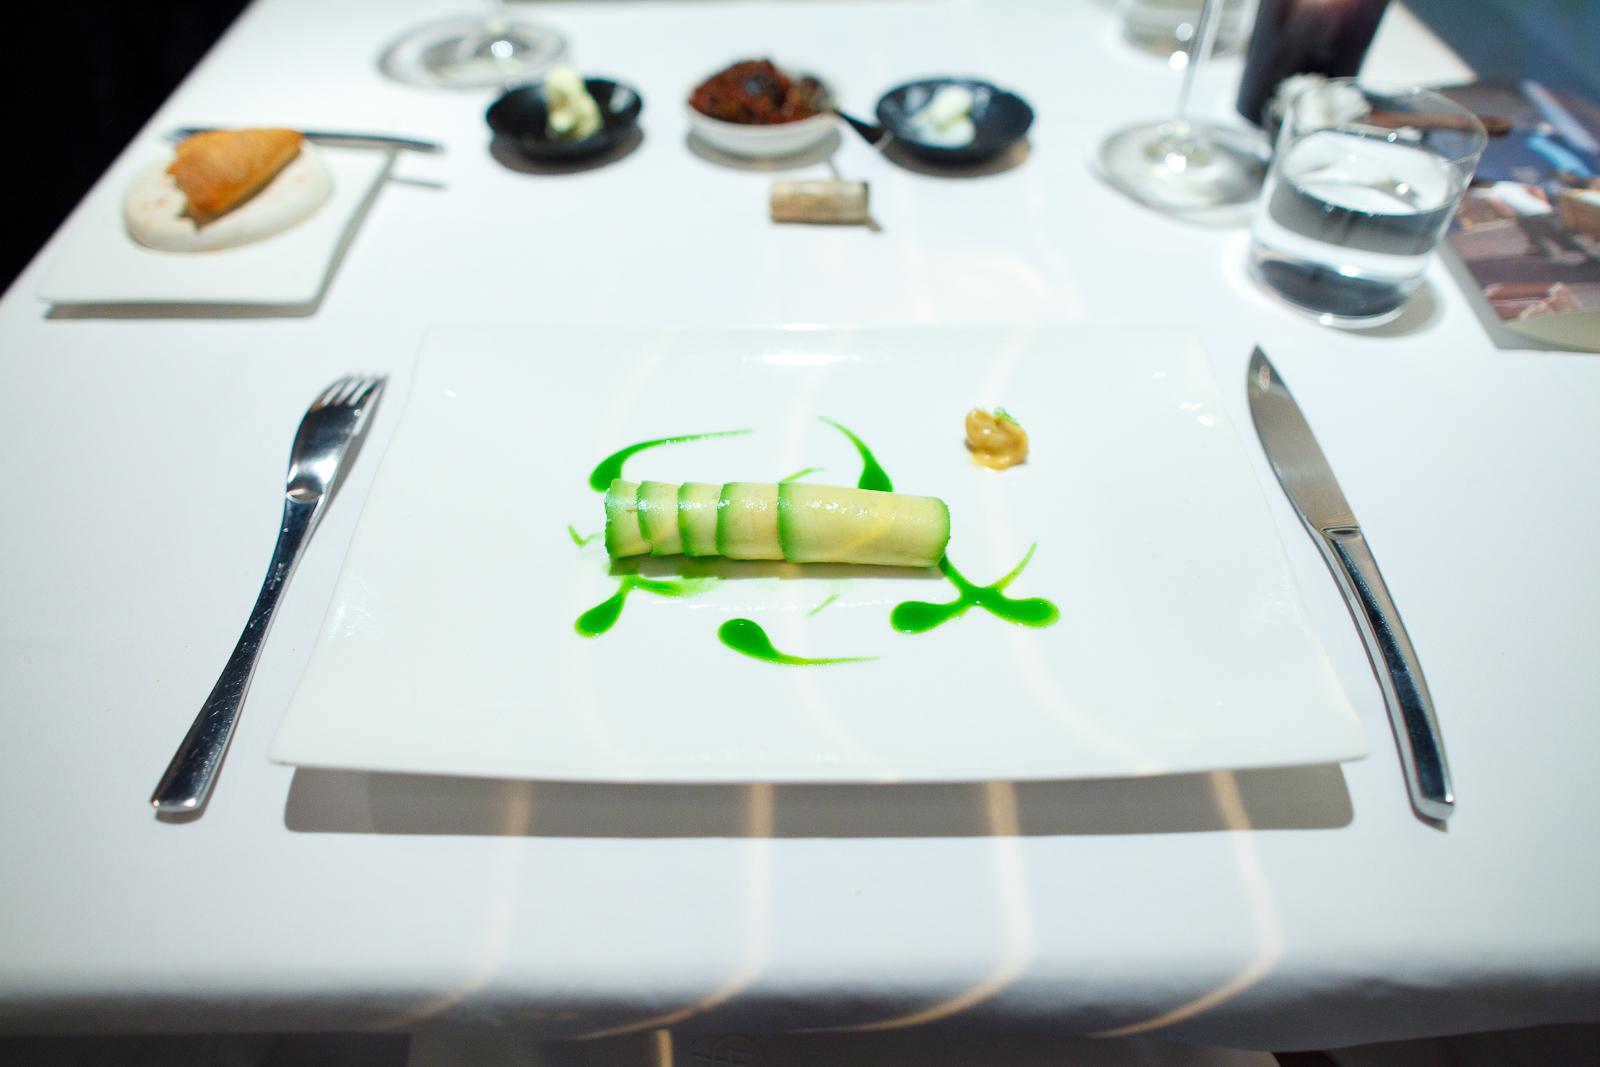 2nd Course: Flautas de aguacate rellenas de camarón cristal. Mayonesa de chipotle rallado. Emulsión de cilantro. (Avocado flautas with raw shrimp, chipotle mayo, cilantro emulsion)